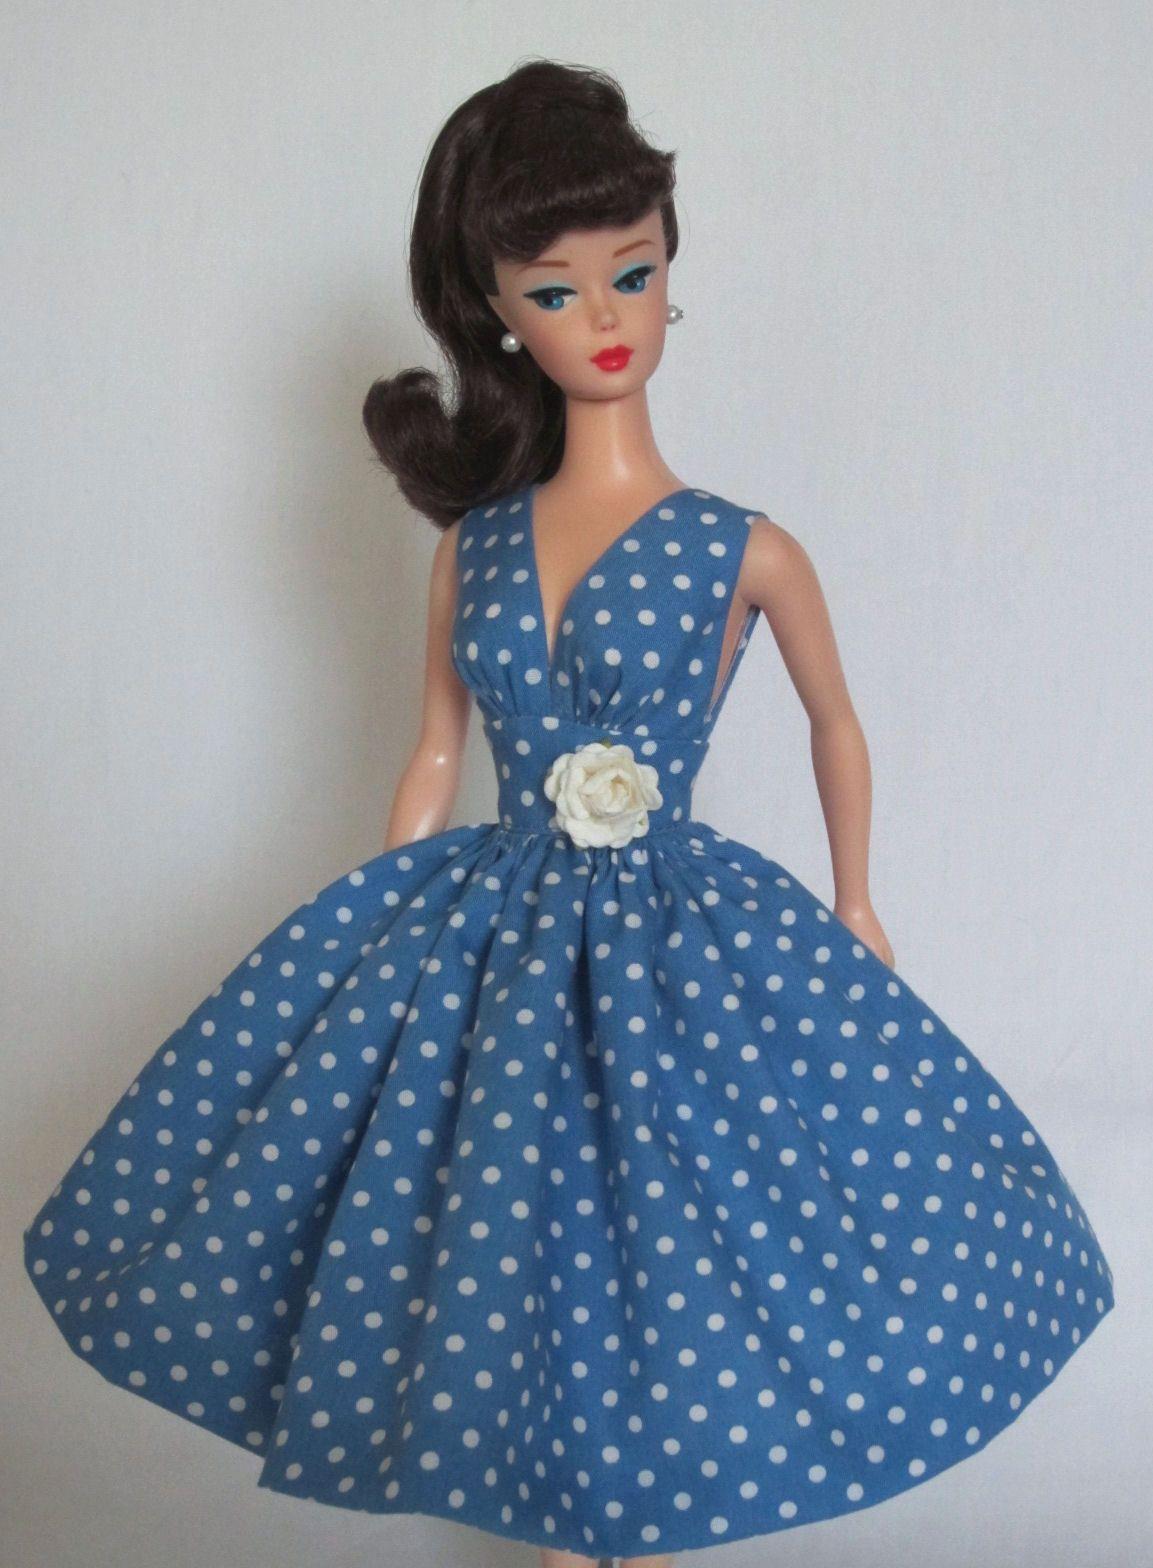 Summer Sizzle Vintage Barbie Doll Dress Reproduction Repro Barbie Clothes Doll Dress Vintage Barbie Clothes Barbie Clothes